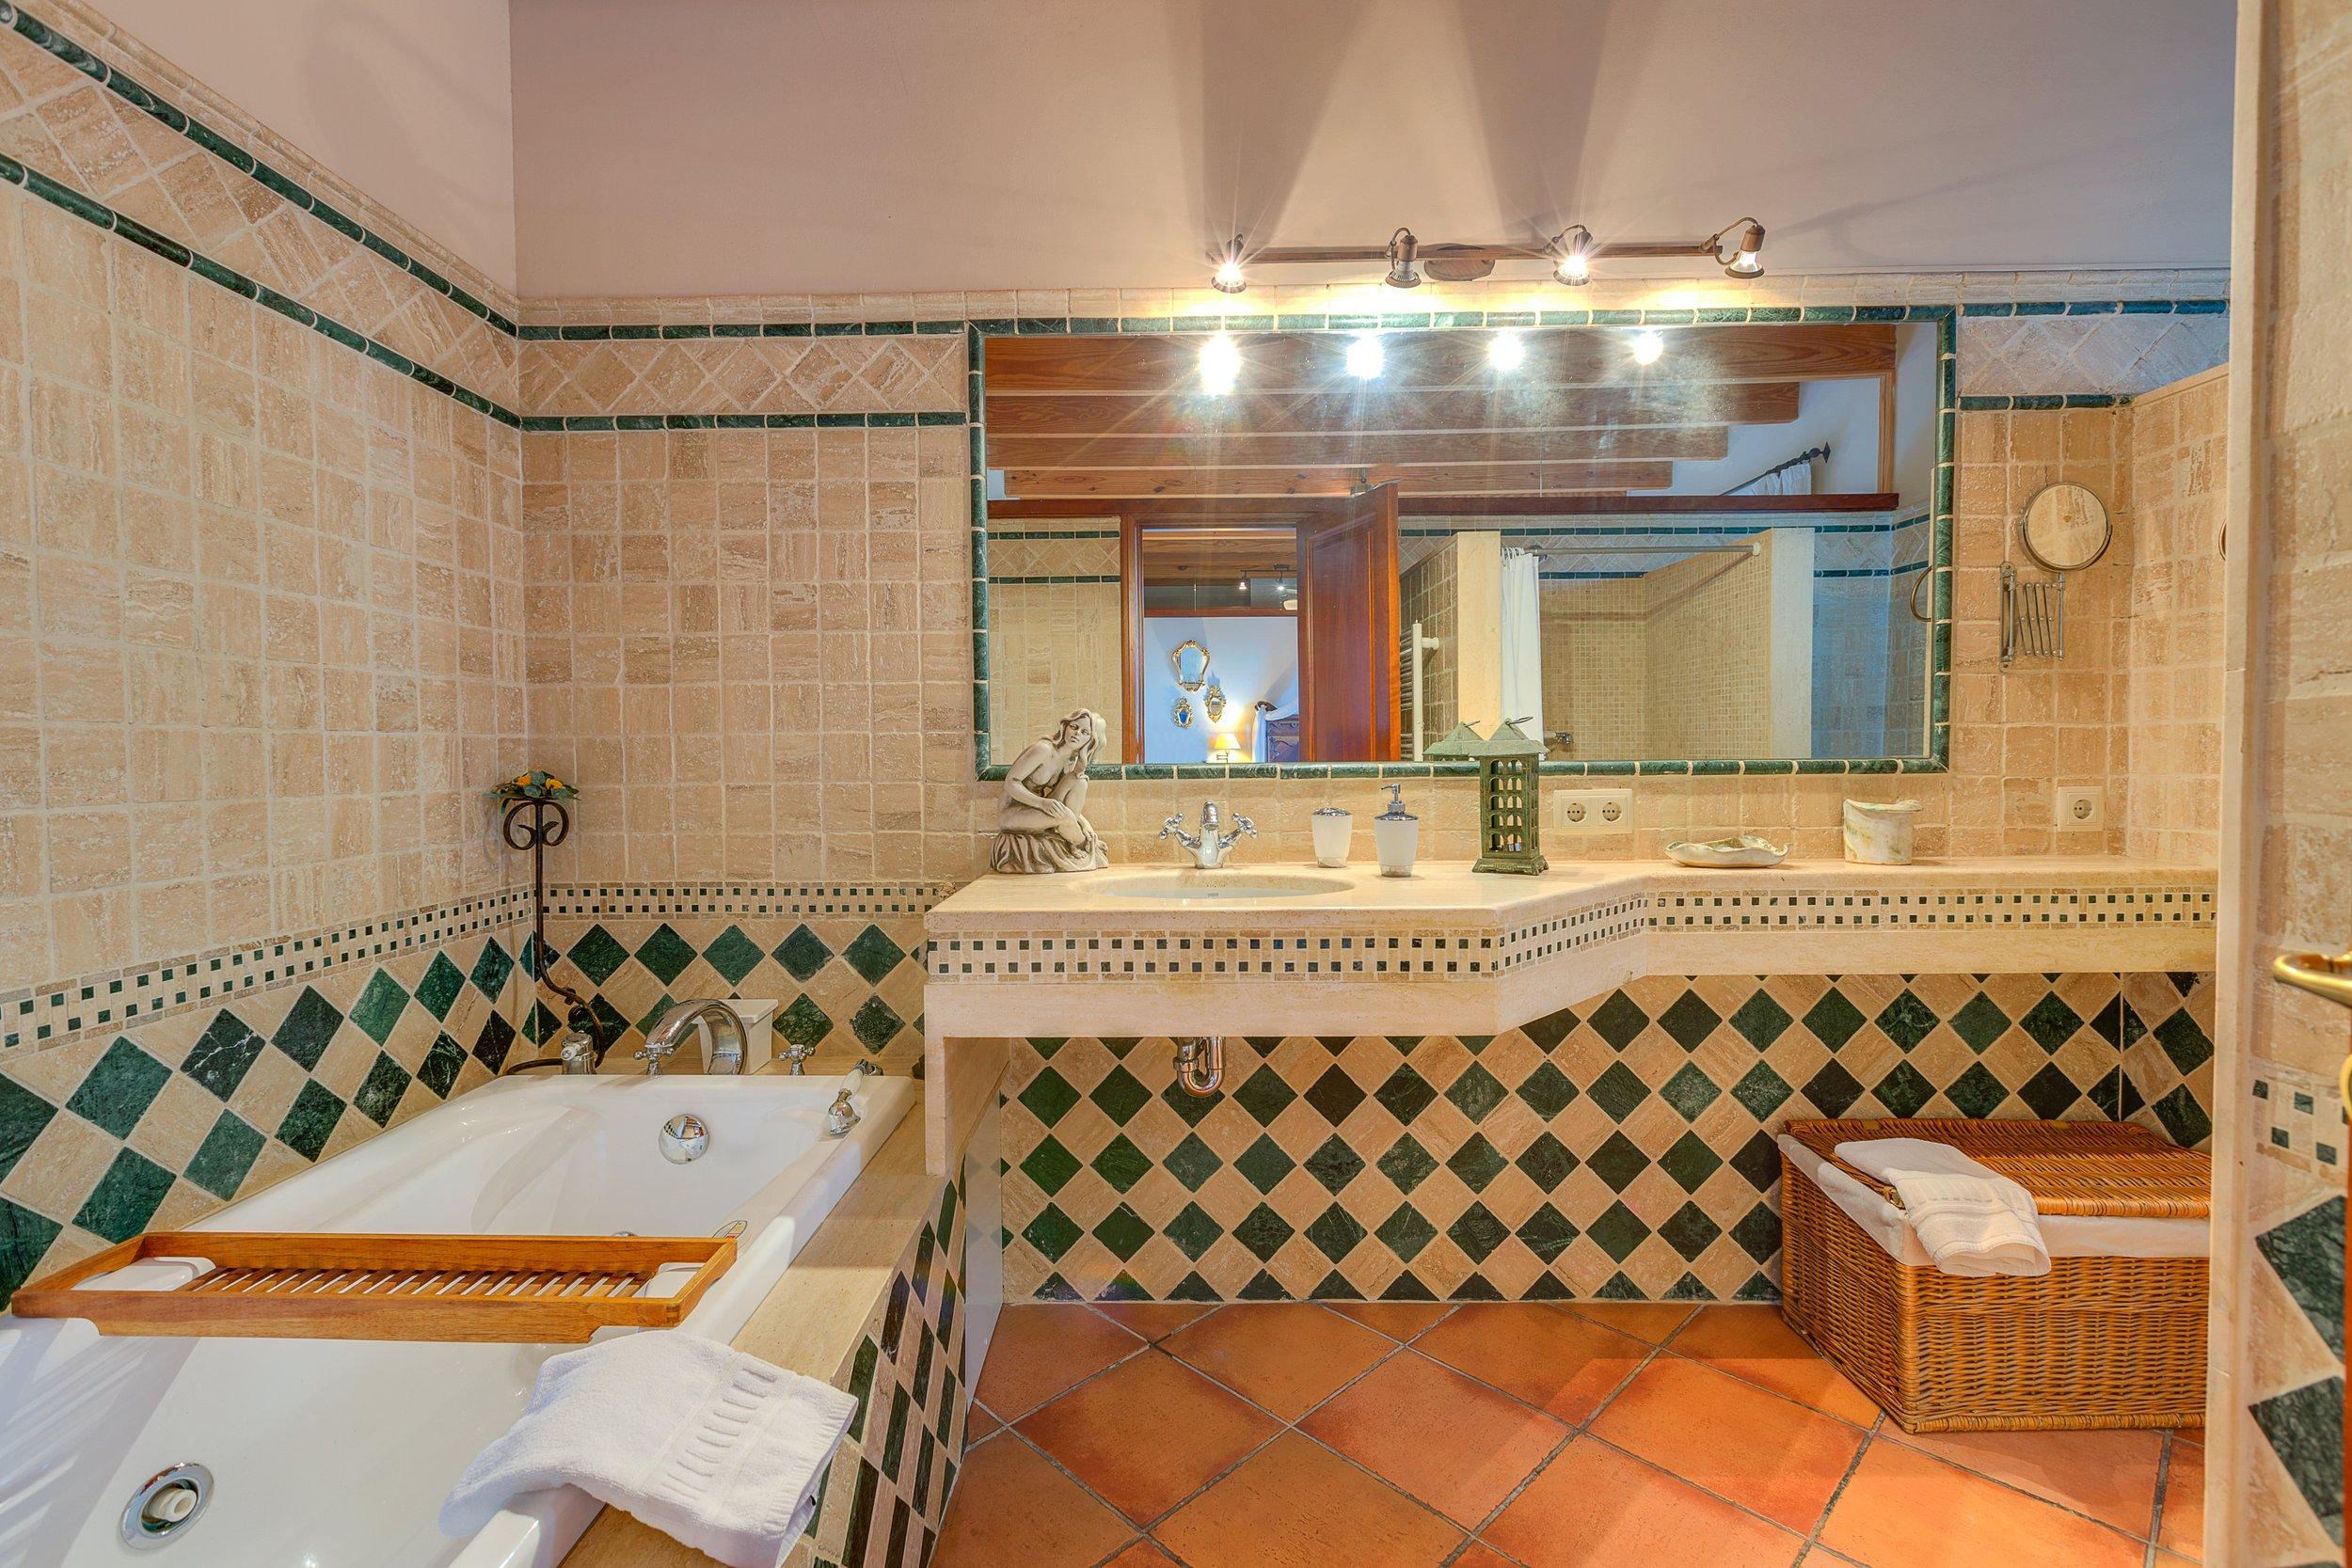 Maison de vacances Villa Cirera in Alaro (2611793), Alaro, Majorque, Iles Baléares, Espagne, image 20